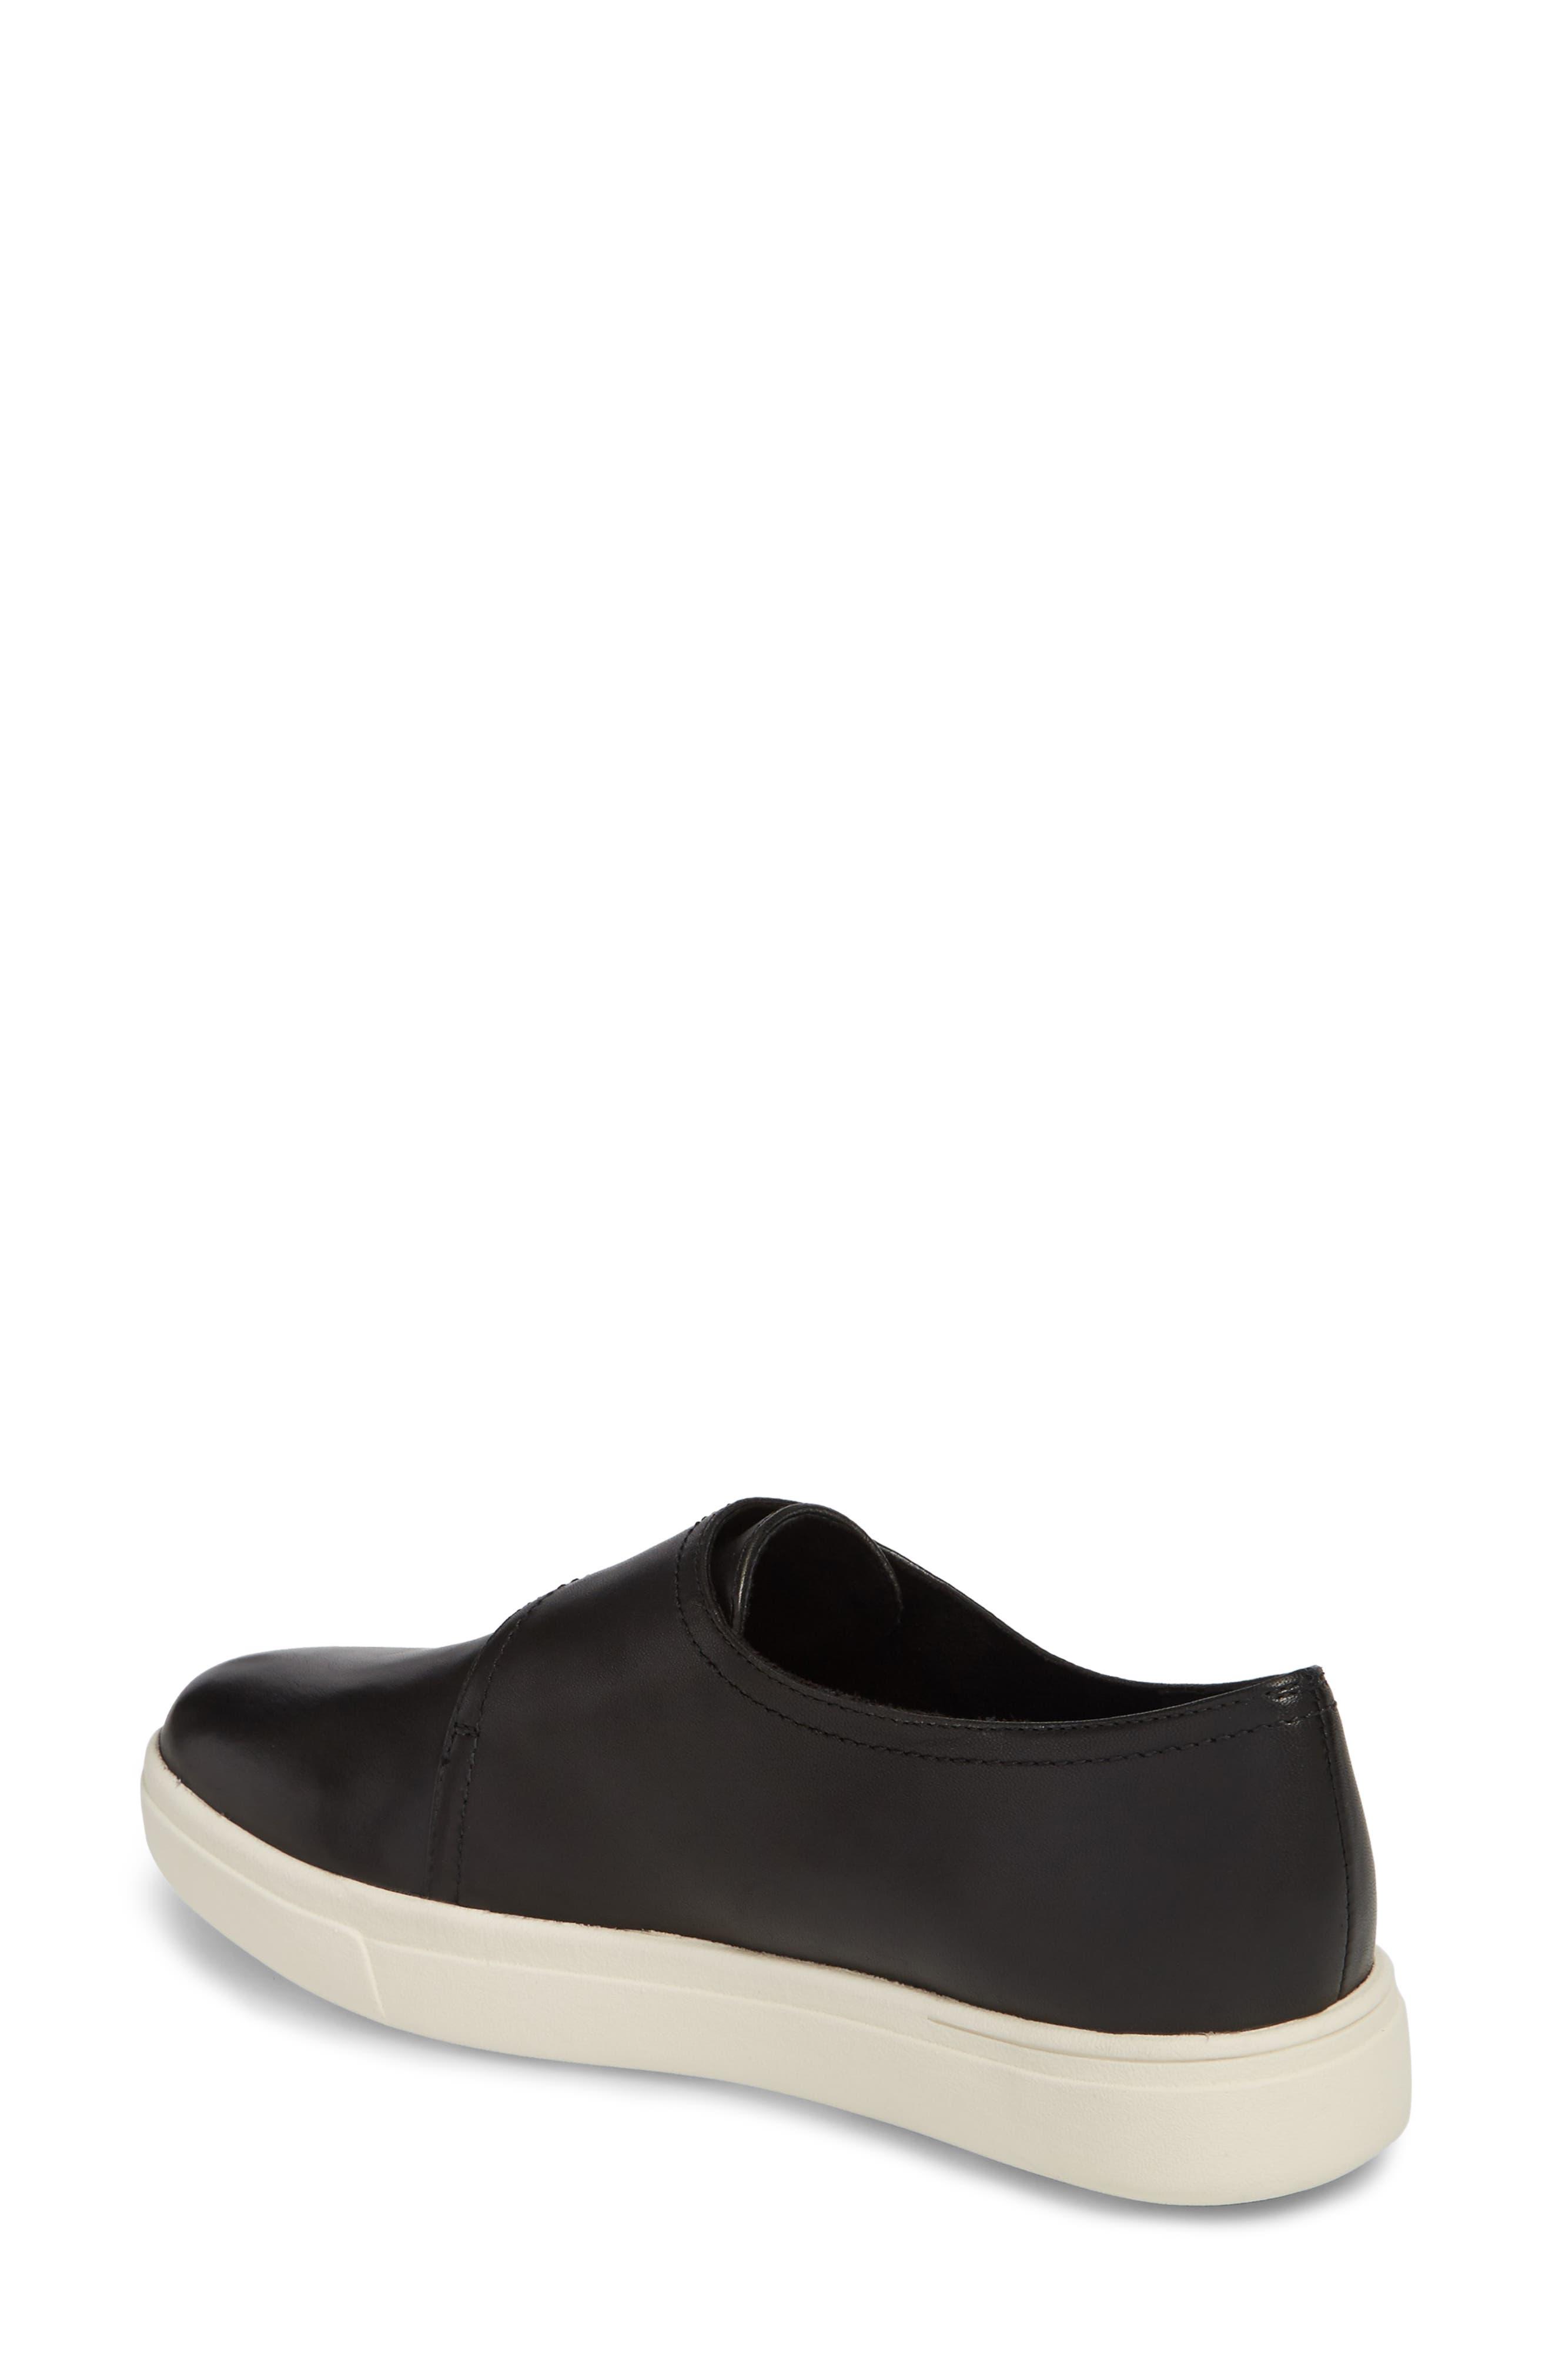 Oberon Slip-On Sneaker,                             Alternate thumbnail 2, color,                             Black Leather